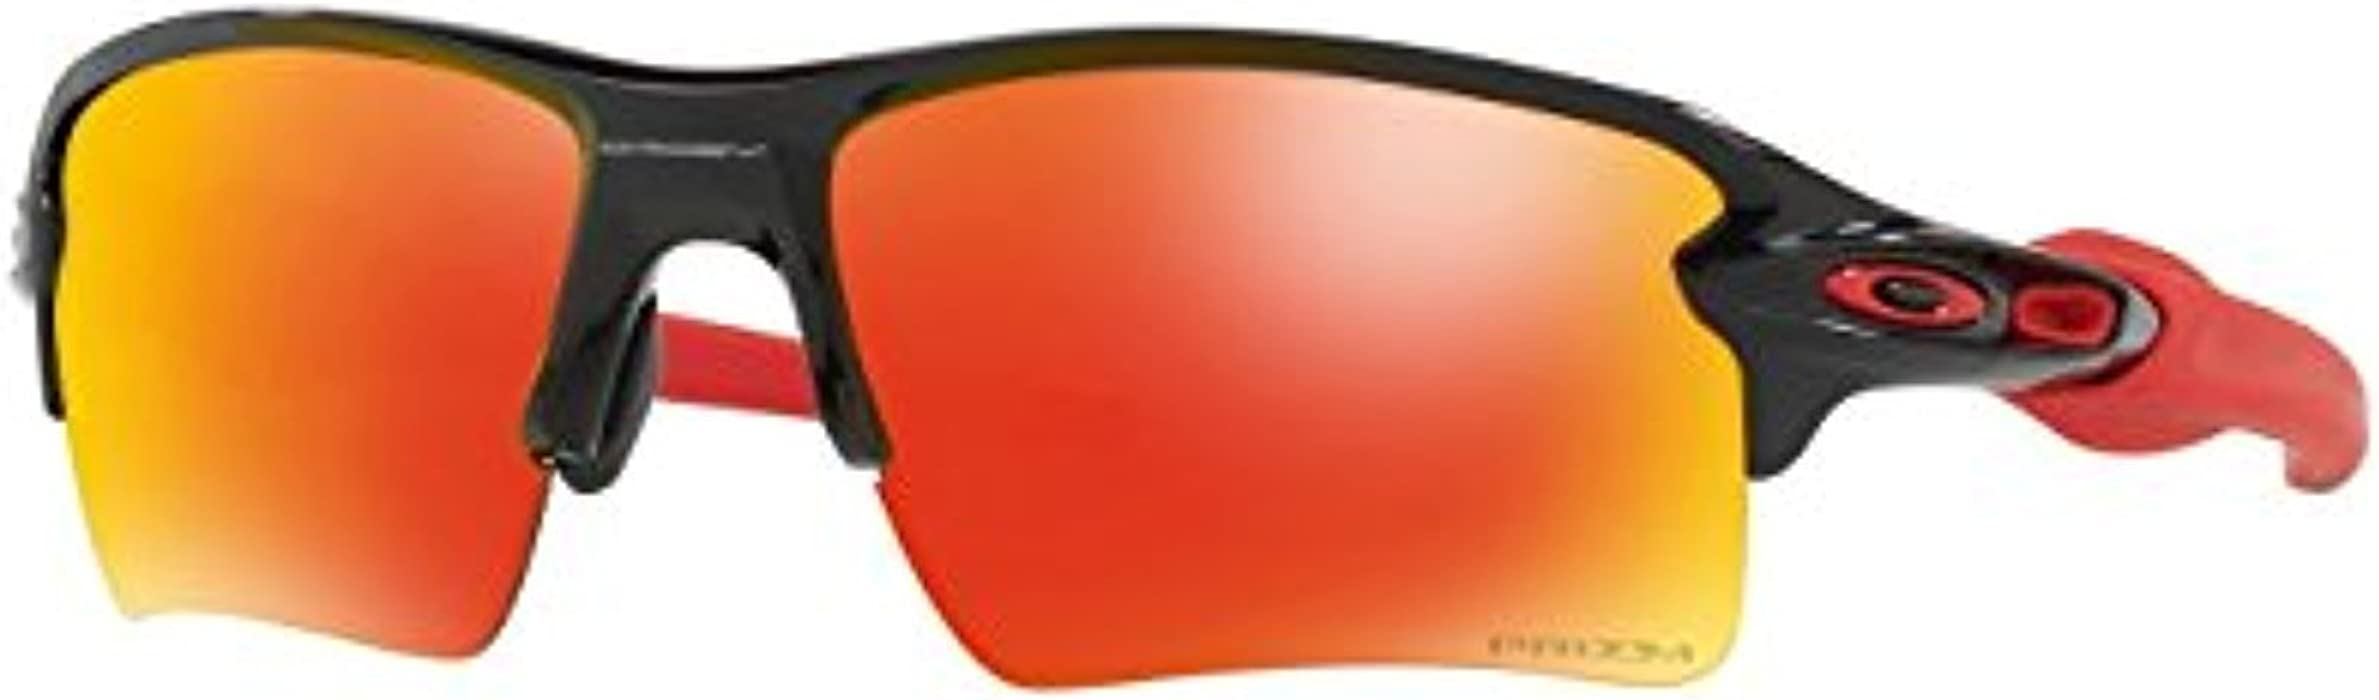 d7d5e12780234 Oakley Flak 2.0 XL Sunglasses Polished Black Prizm Ruby   Cleaning Kit  Bundle